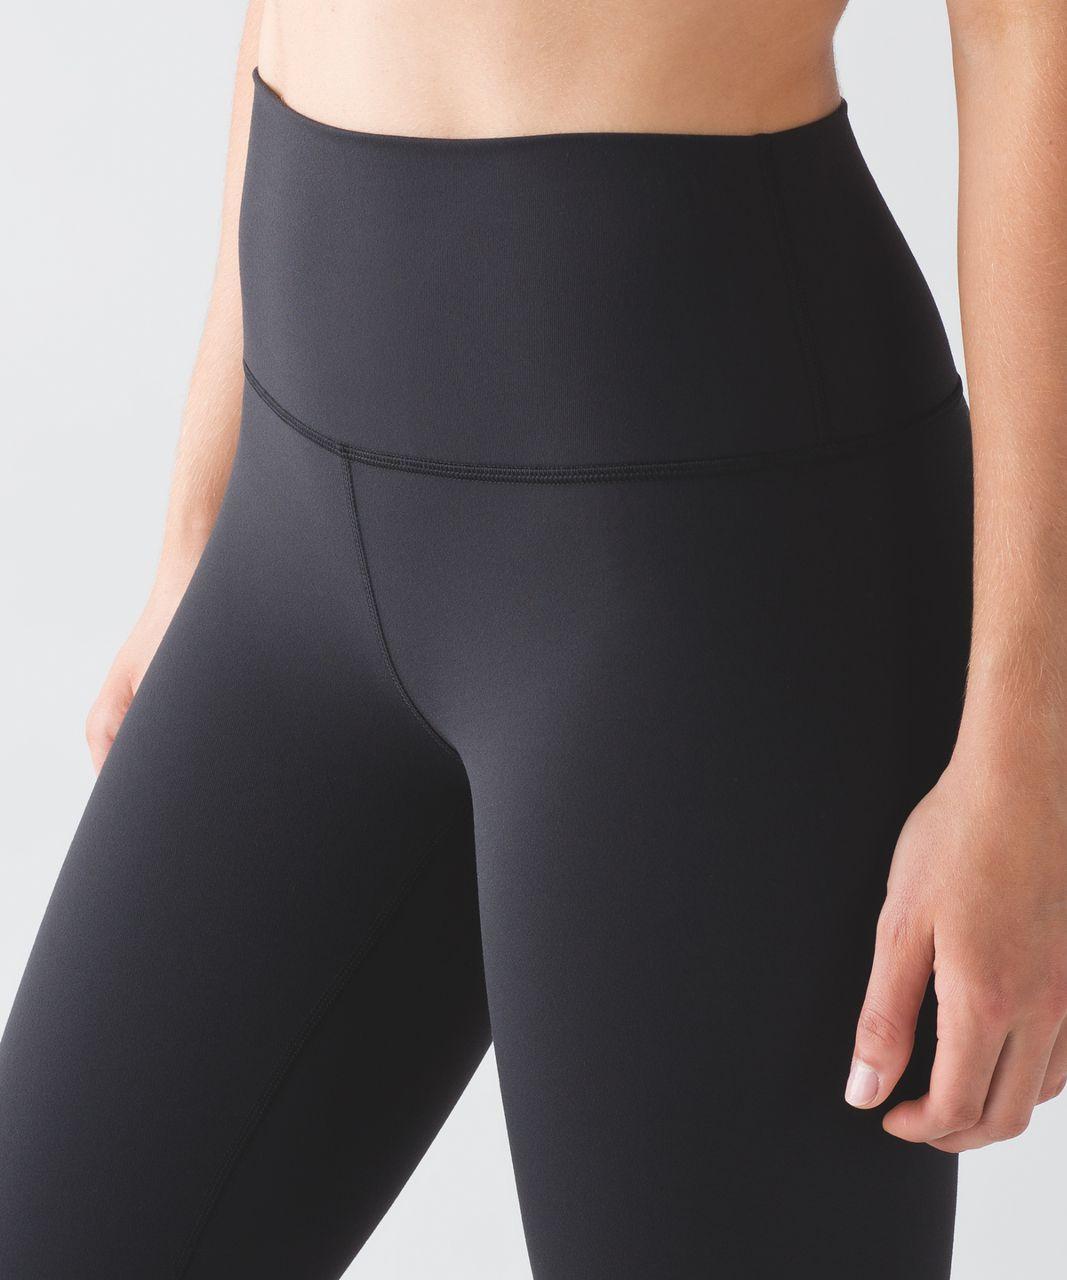 Lululemon High Times Pant - Black